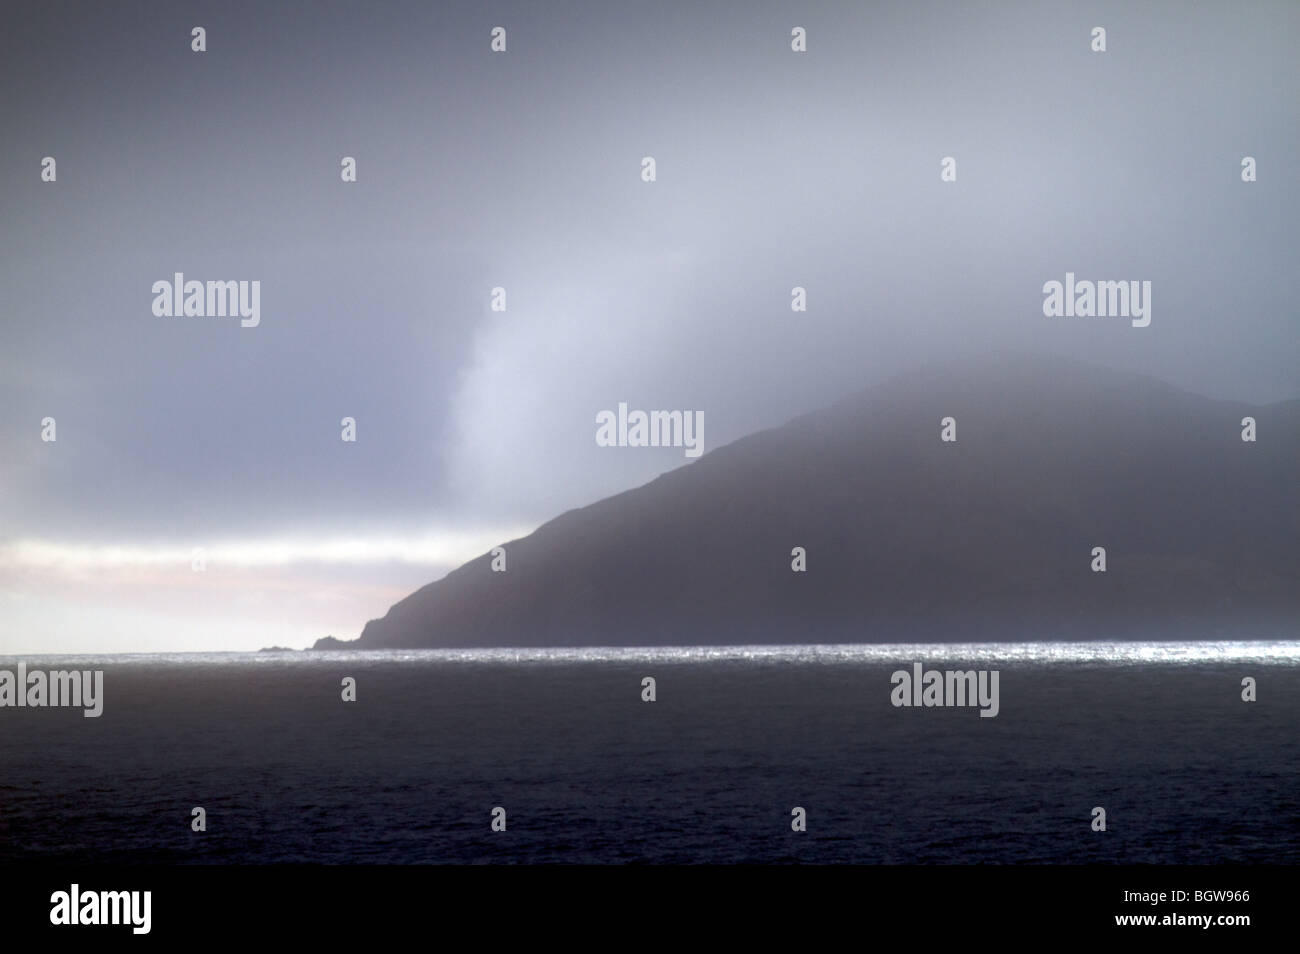 Fog shrouds South Georgia Island - Stock Image